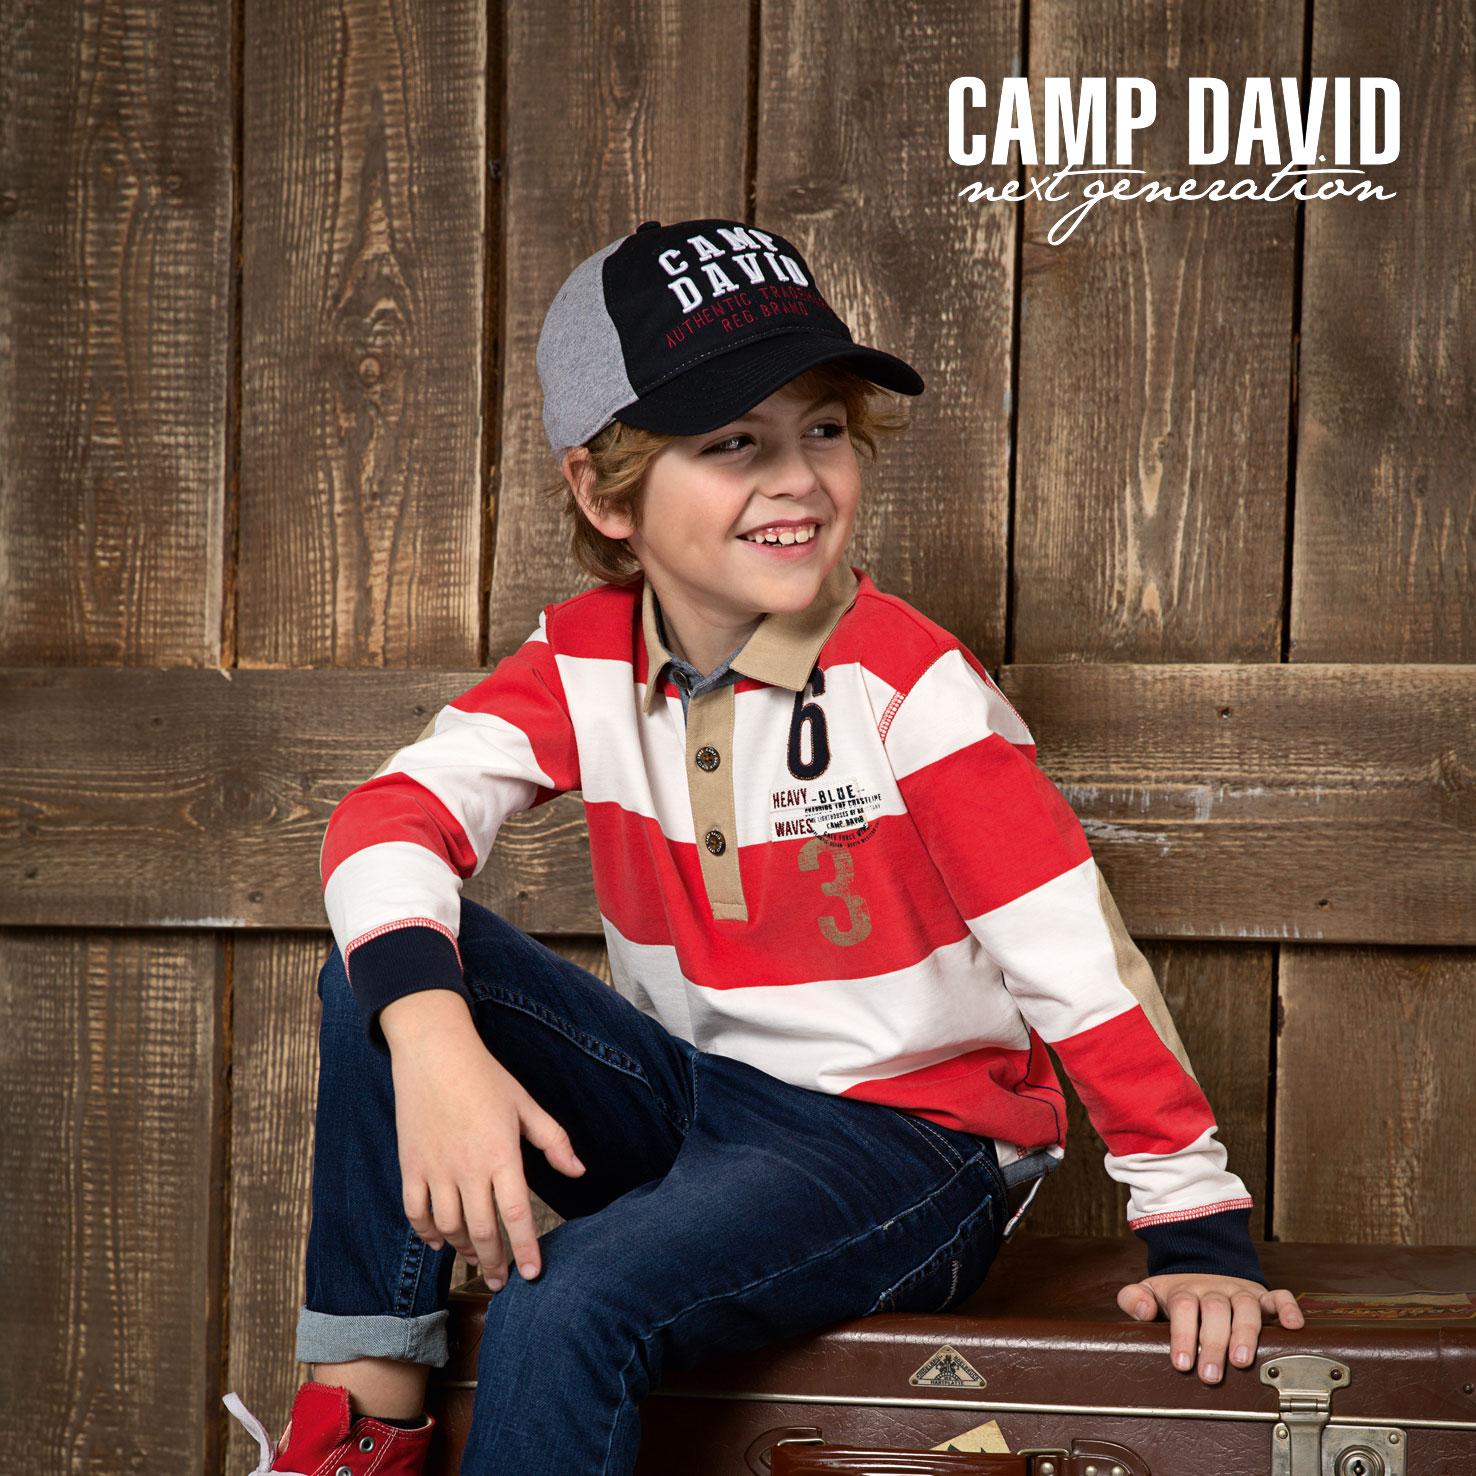 Camp David next generation